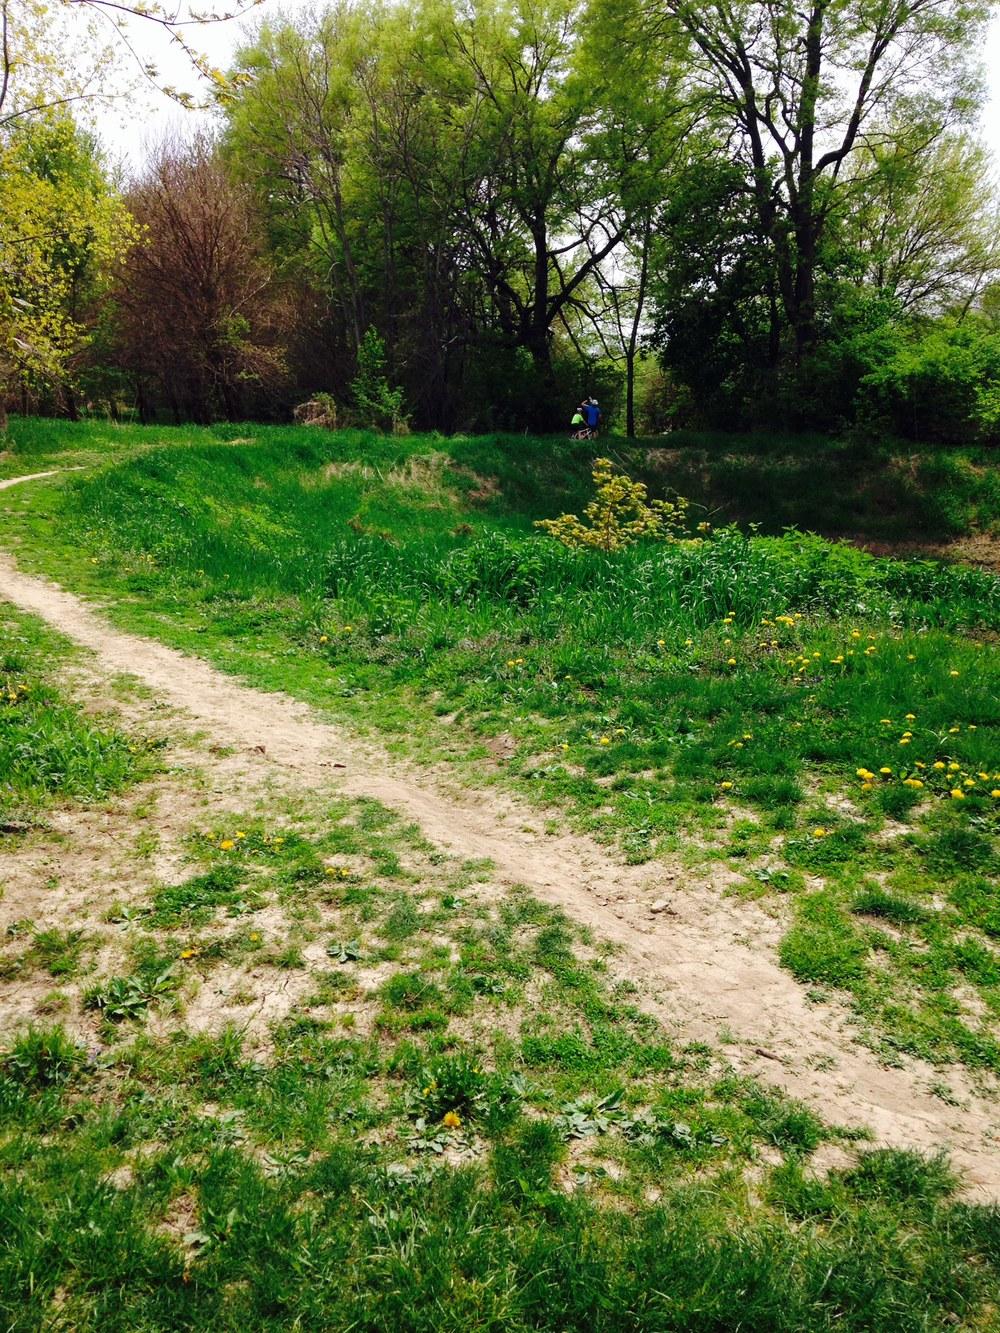 Lafayette's idea of a bike path?